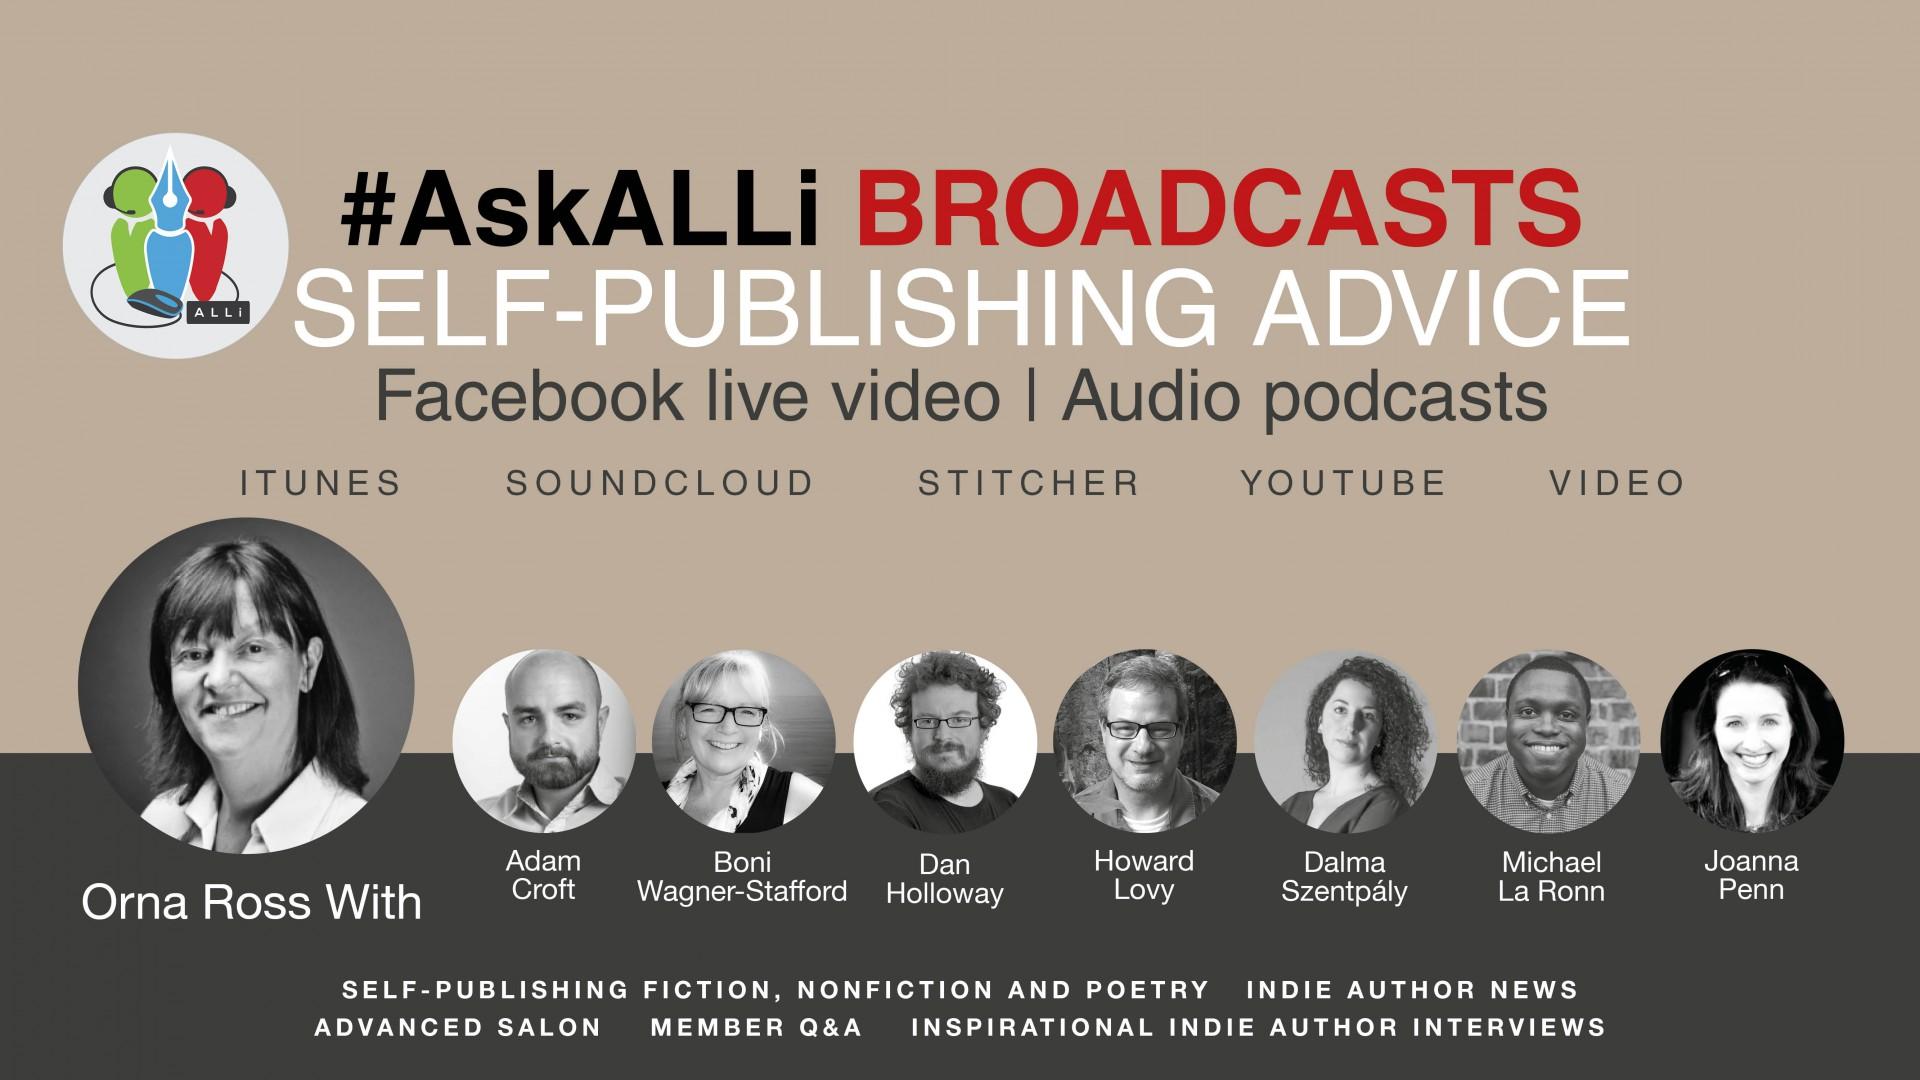 Self-Publishing Broadcasts